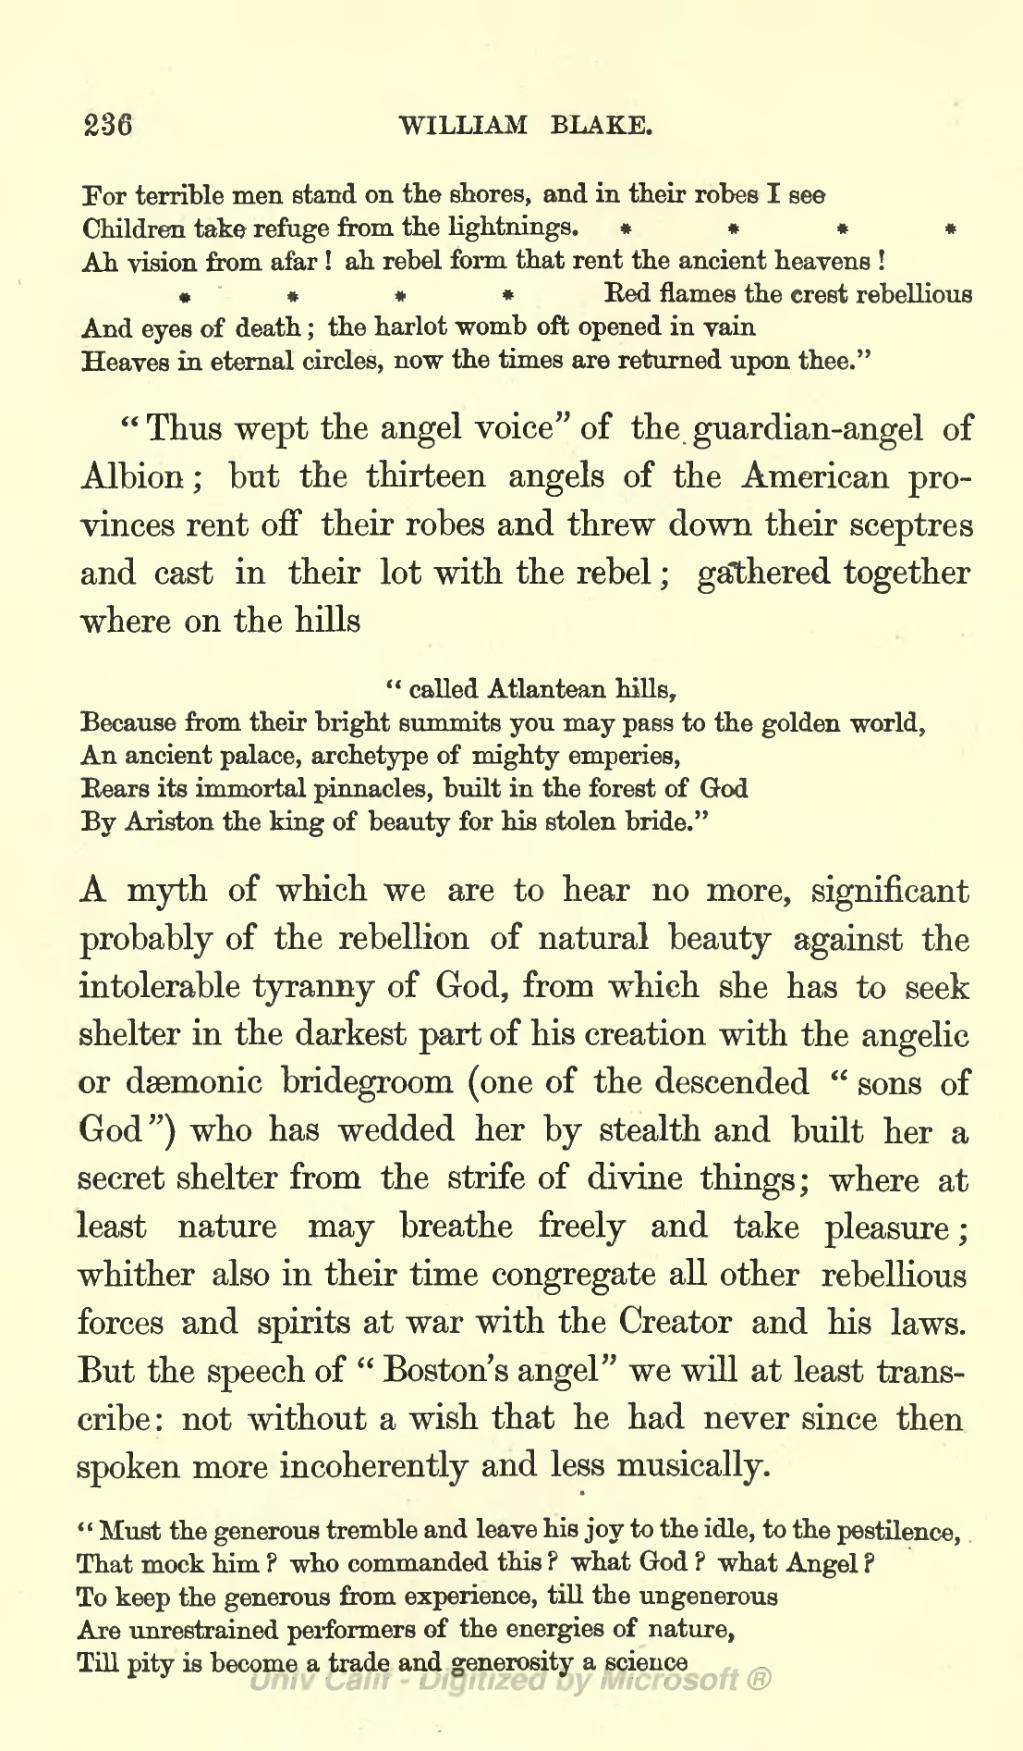 007 Beauty Of Nature Essay Page268 1024px William Blake2c A Critical 28swinburne29 Djvu Awful In Tamil On Hindi Language Pdf Full